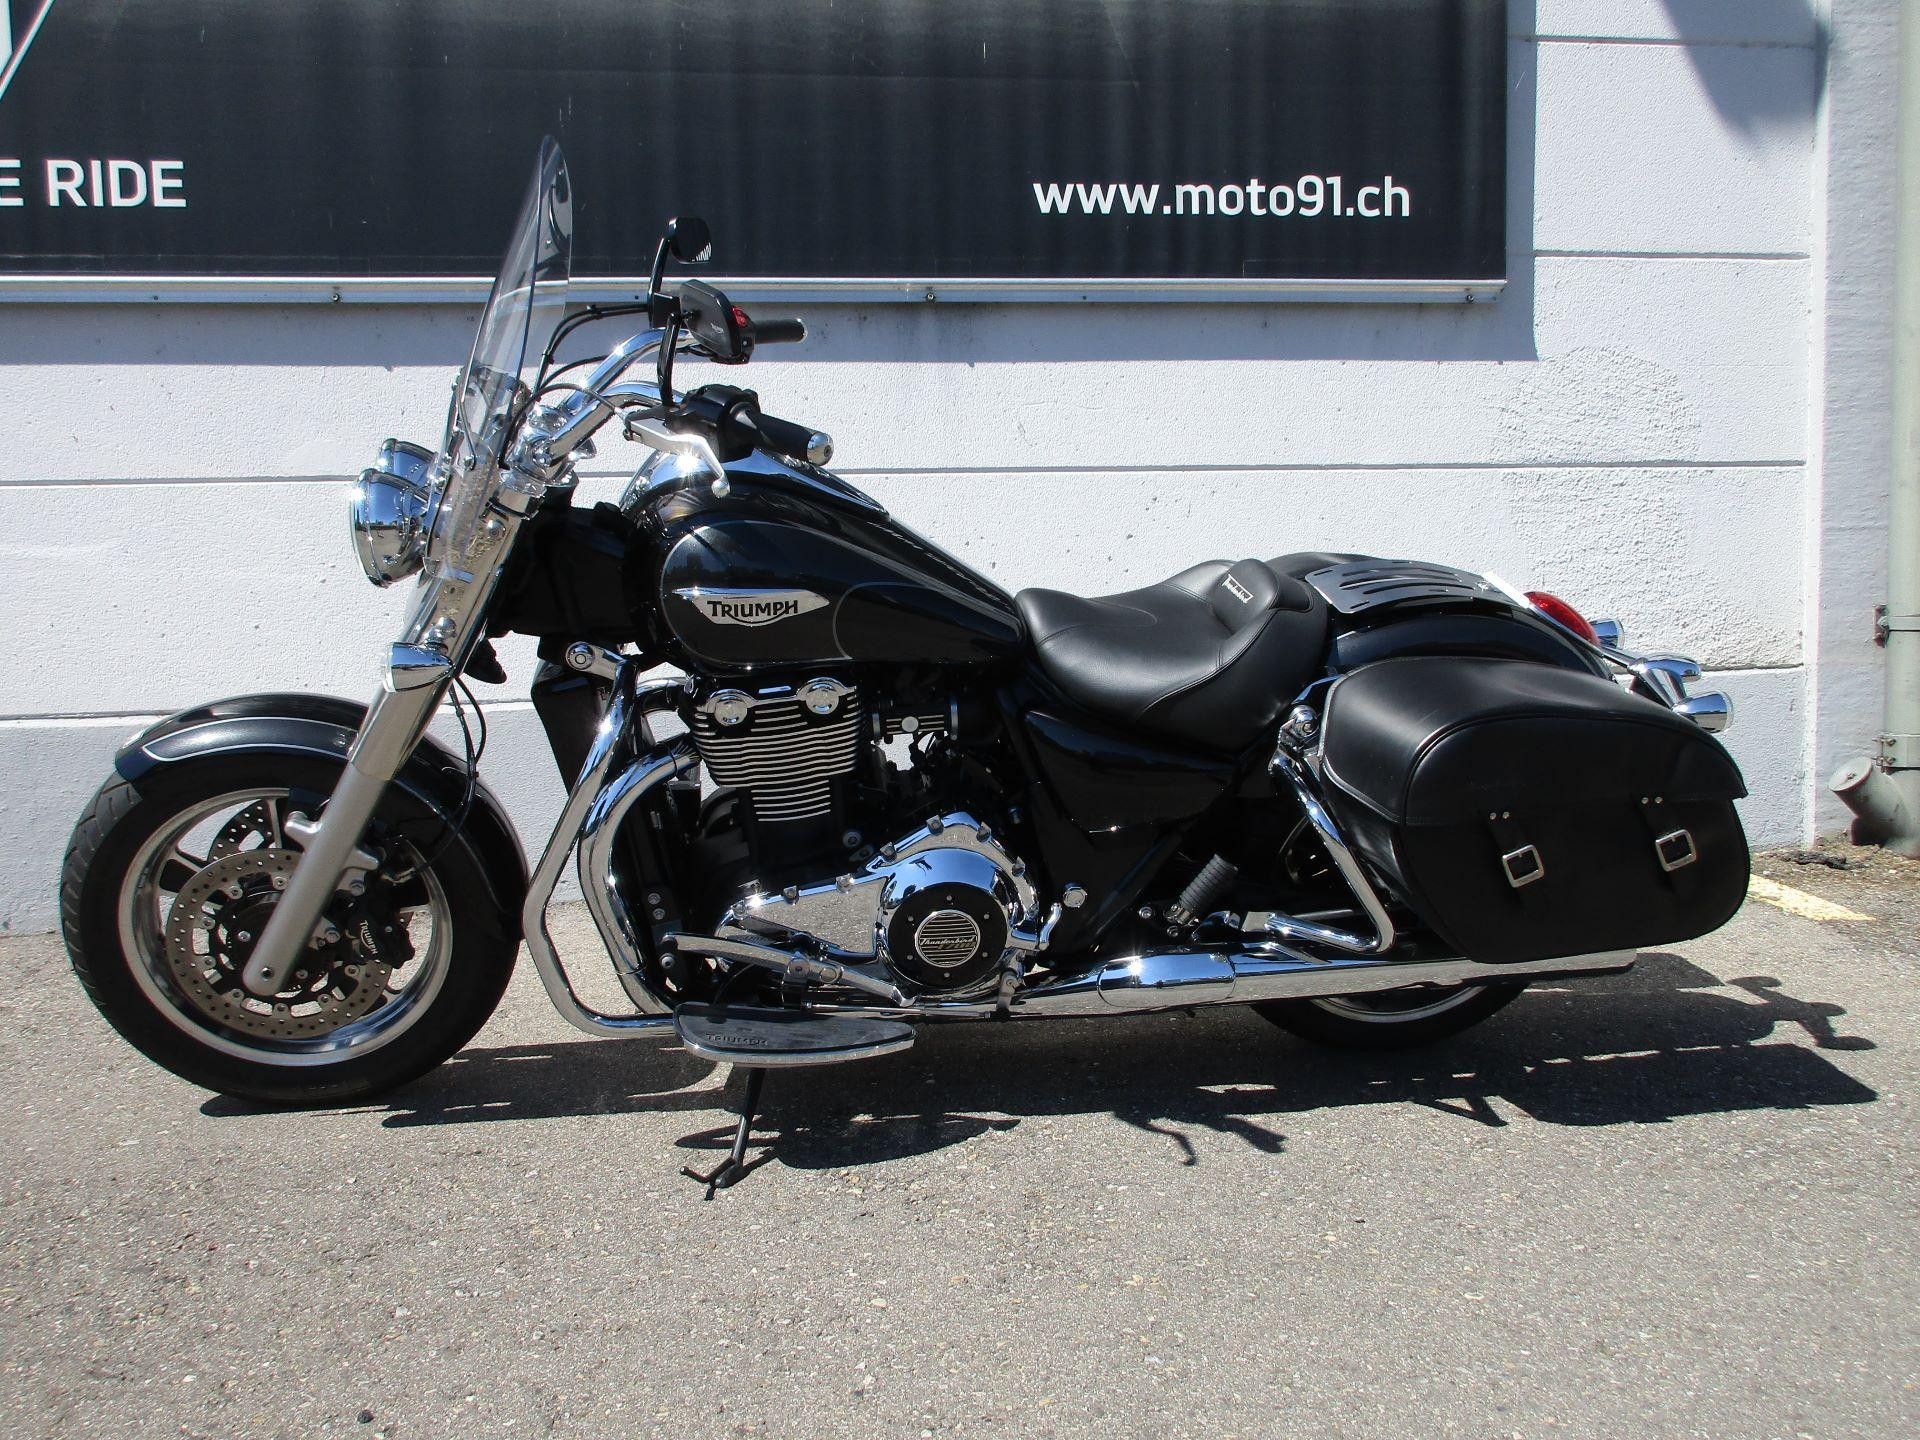 motorrad occasion kaufen triumph thunderbird 1700 abs commander moto 91 ag h ri. Black Bedroom Furniture Sets. Home Design Ideas